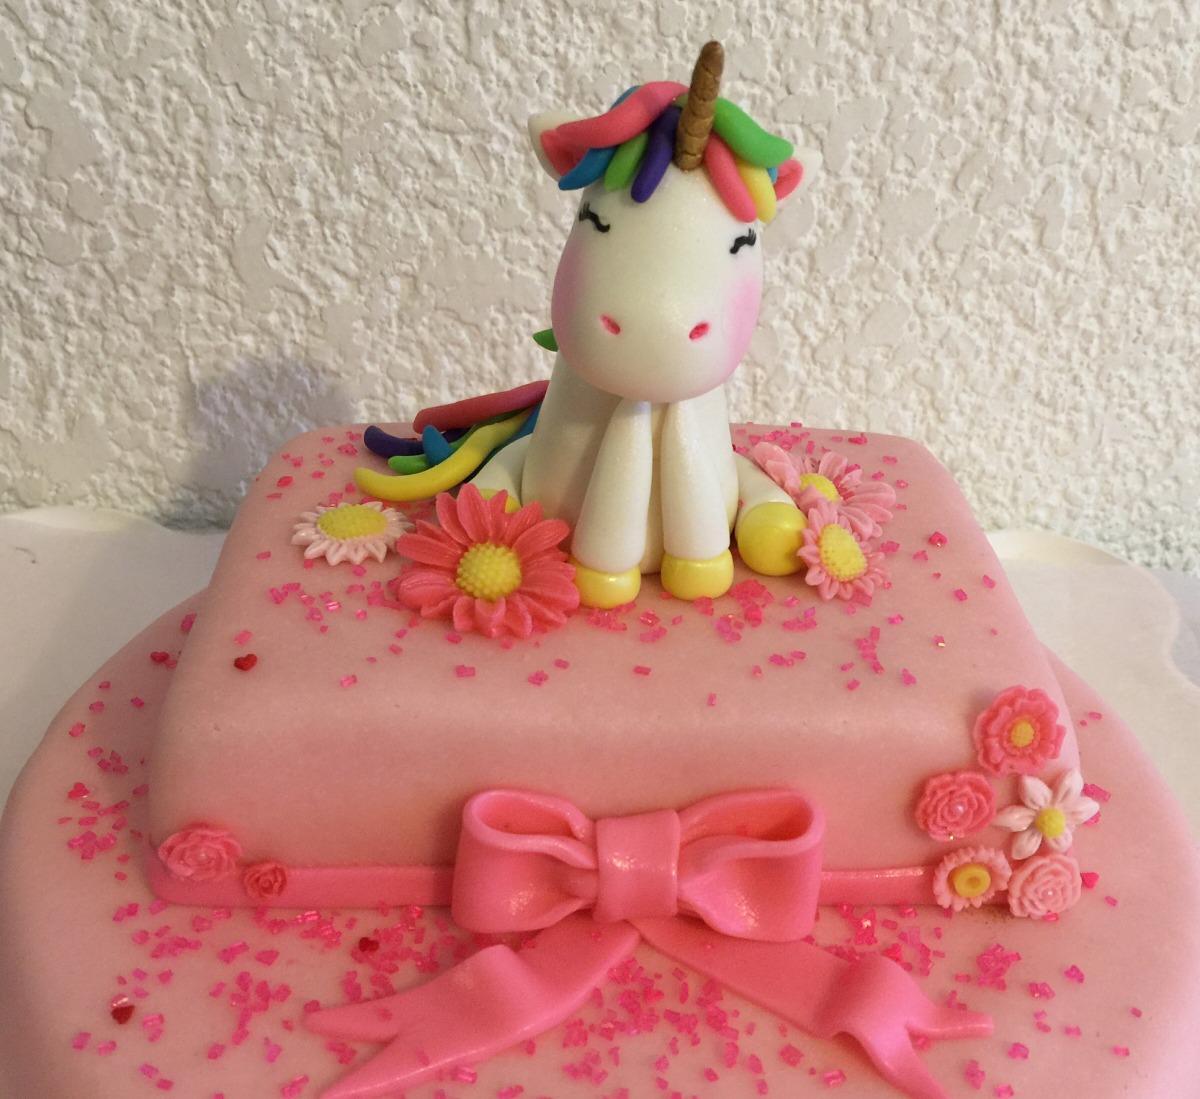 Pastel Decorado Con Fondant Unicornio 1000 En Mercado Libre - Fotos-de-pasteles-decorados